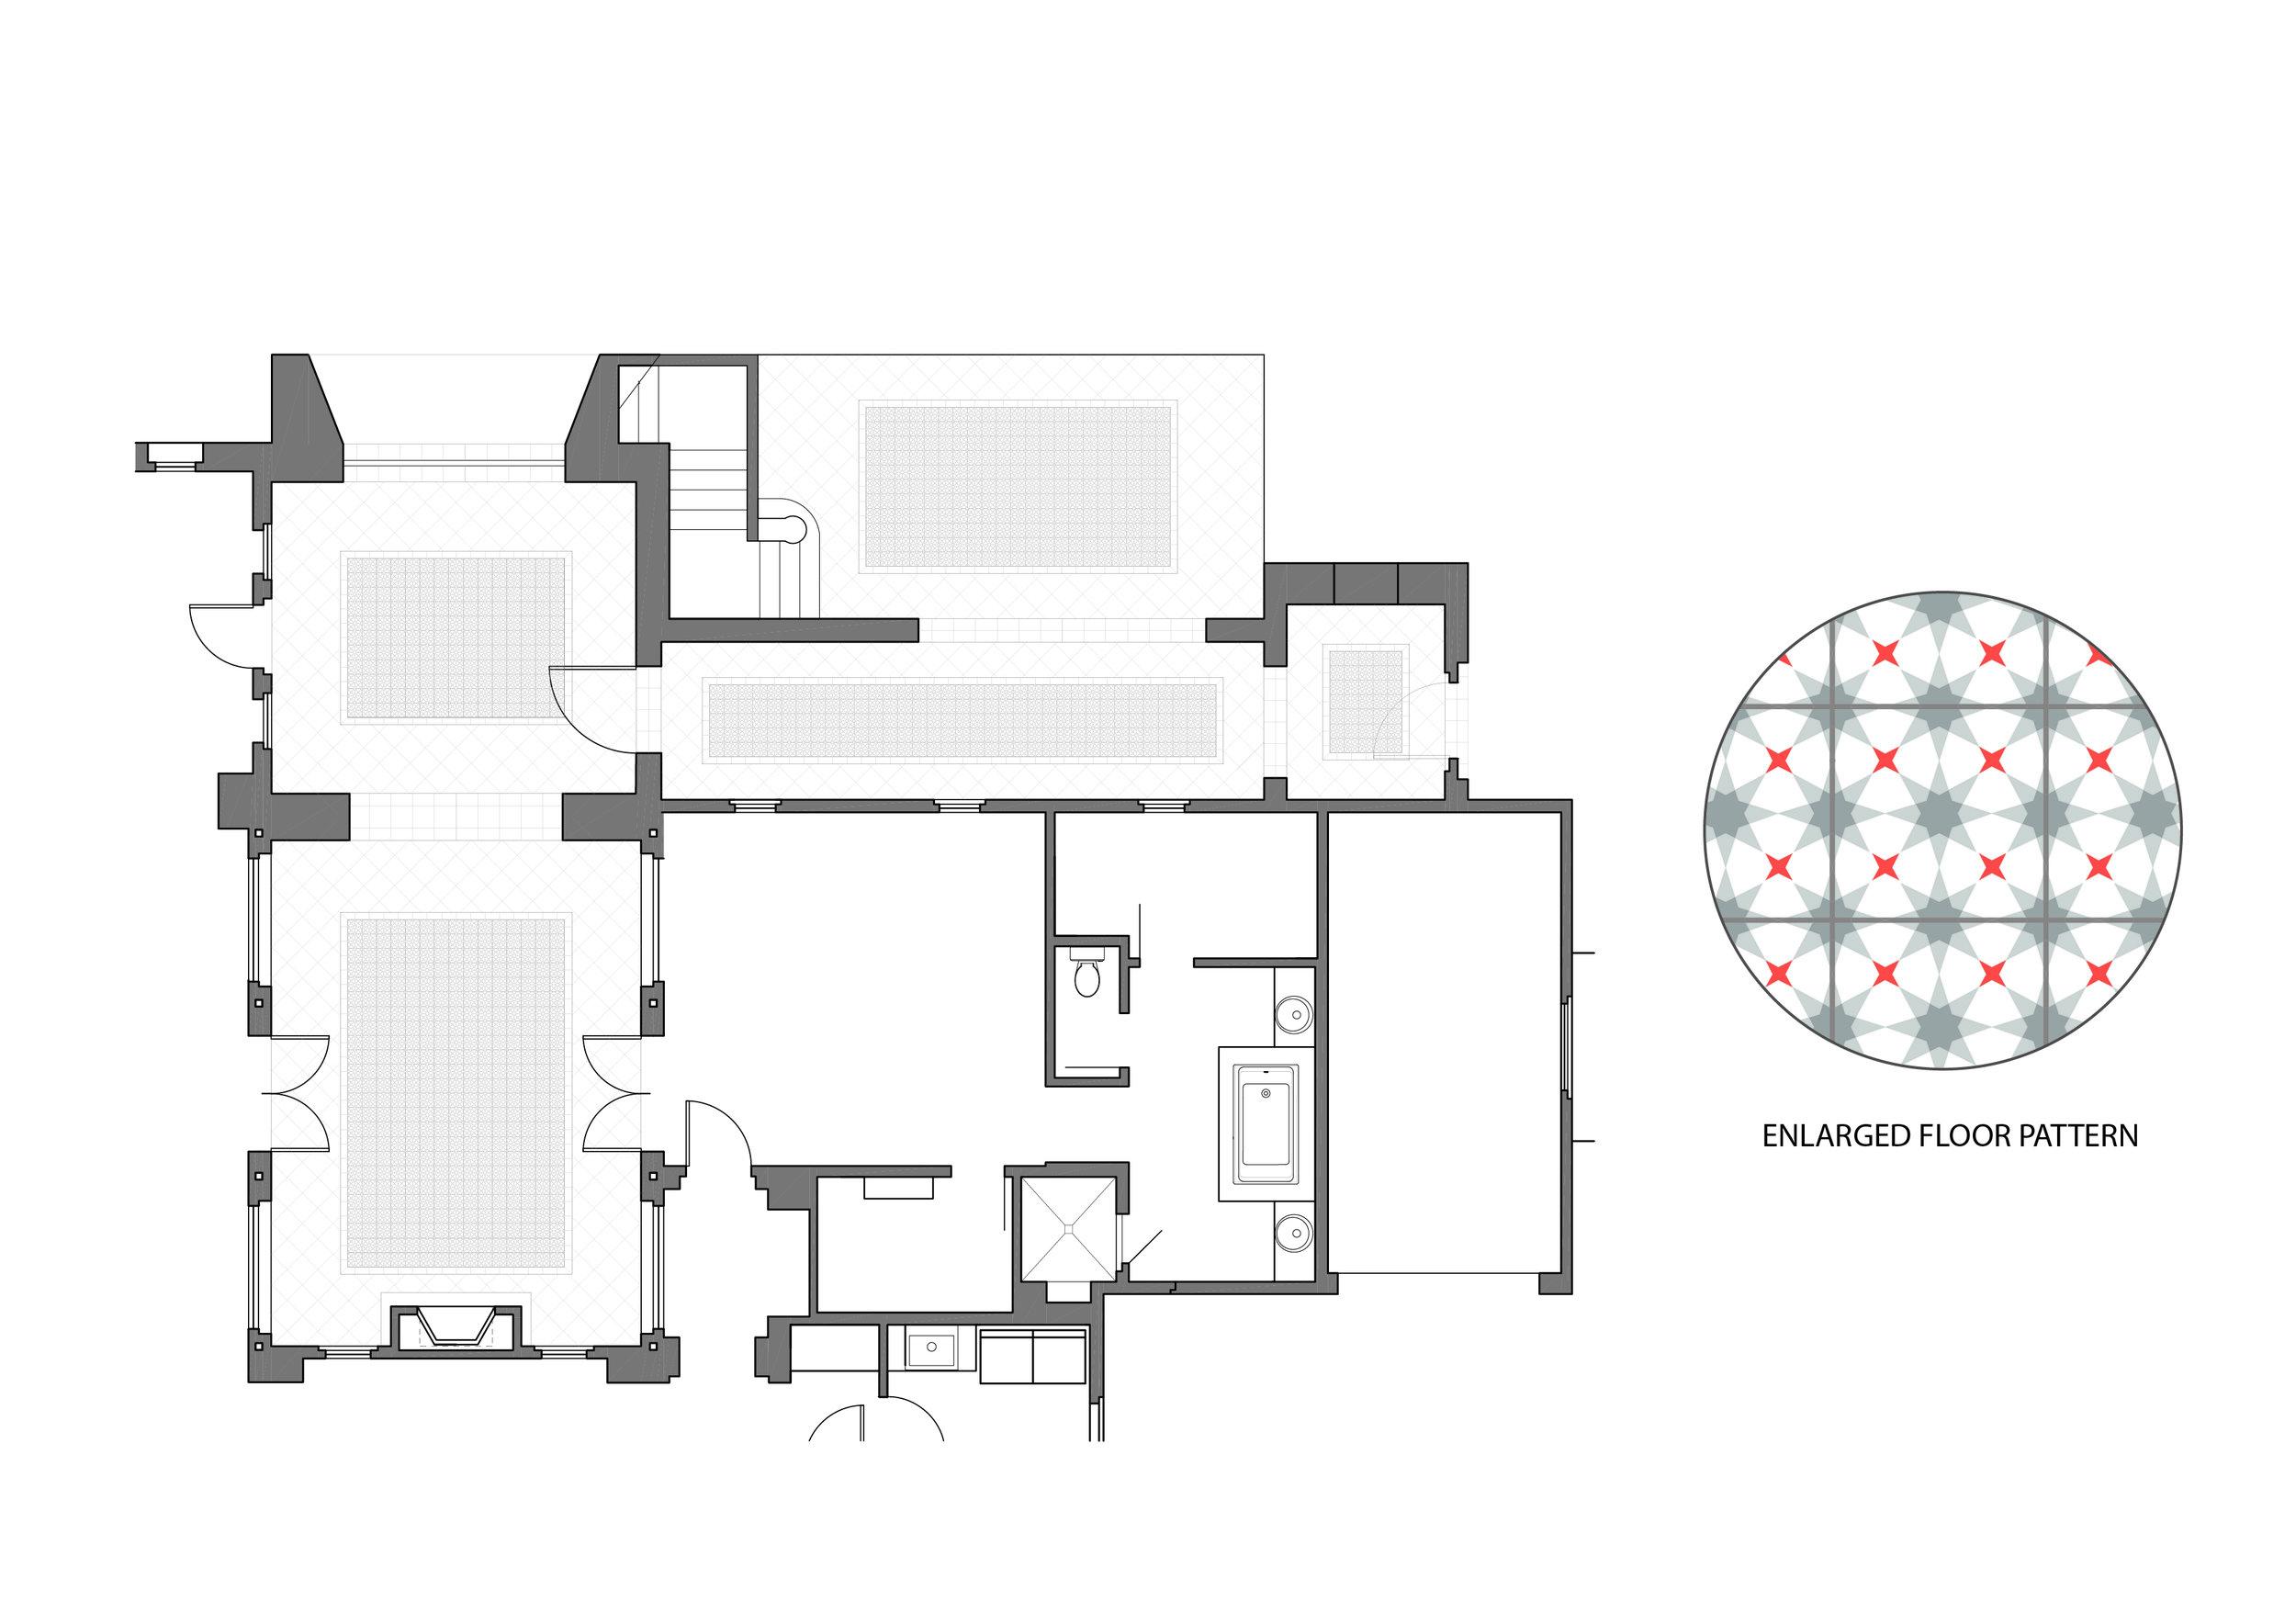 plan-01-01.jpg